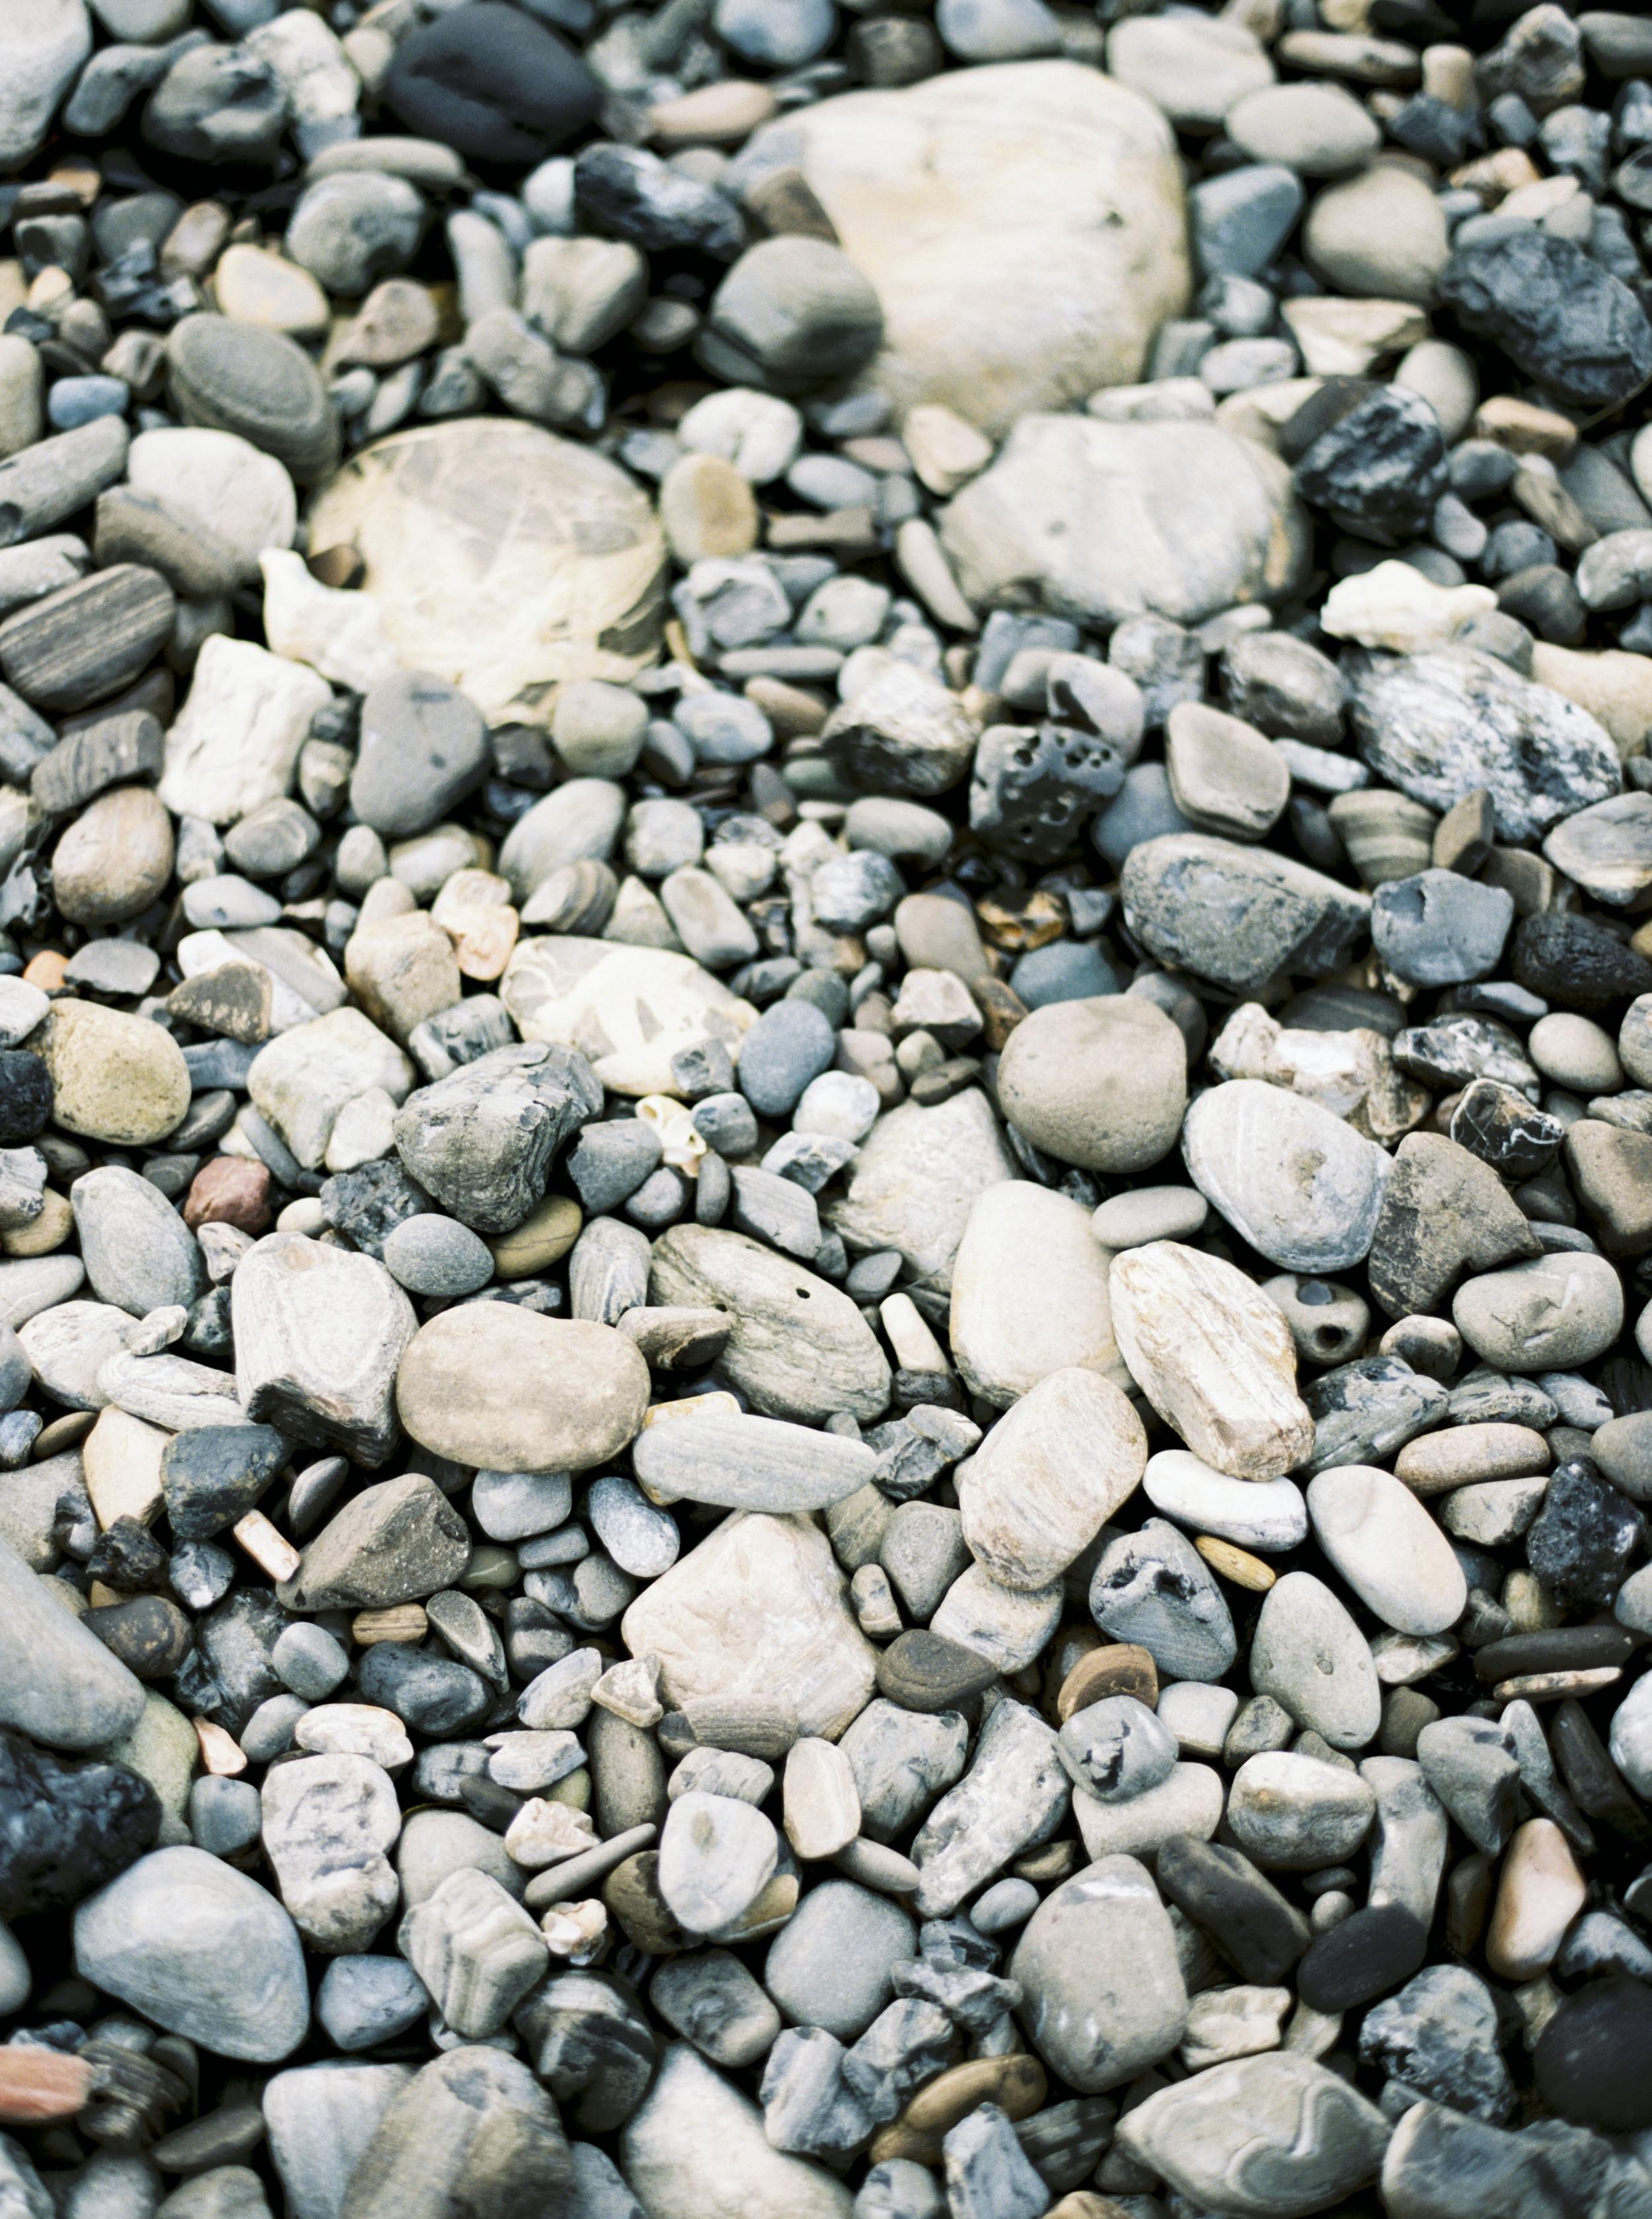 8680_06amandalenhardt.JPG